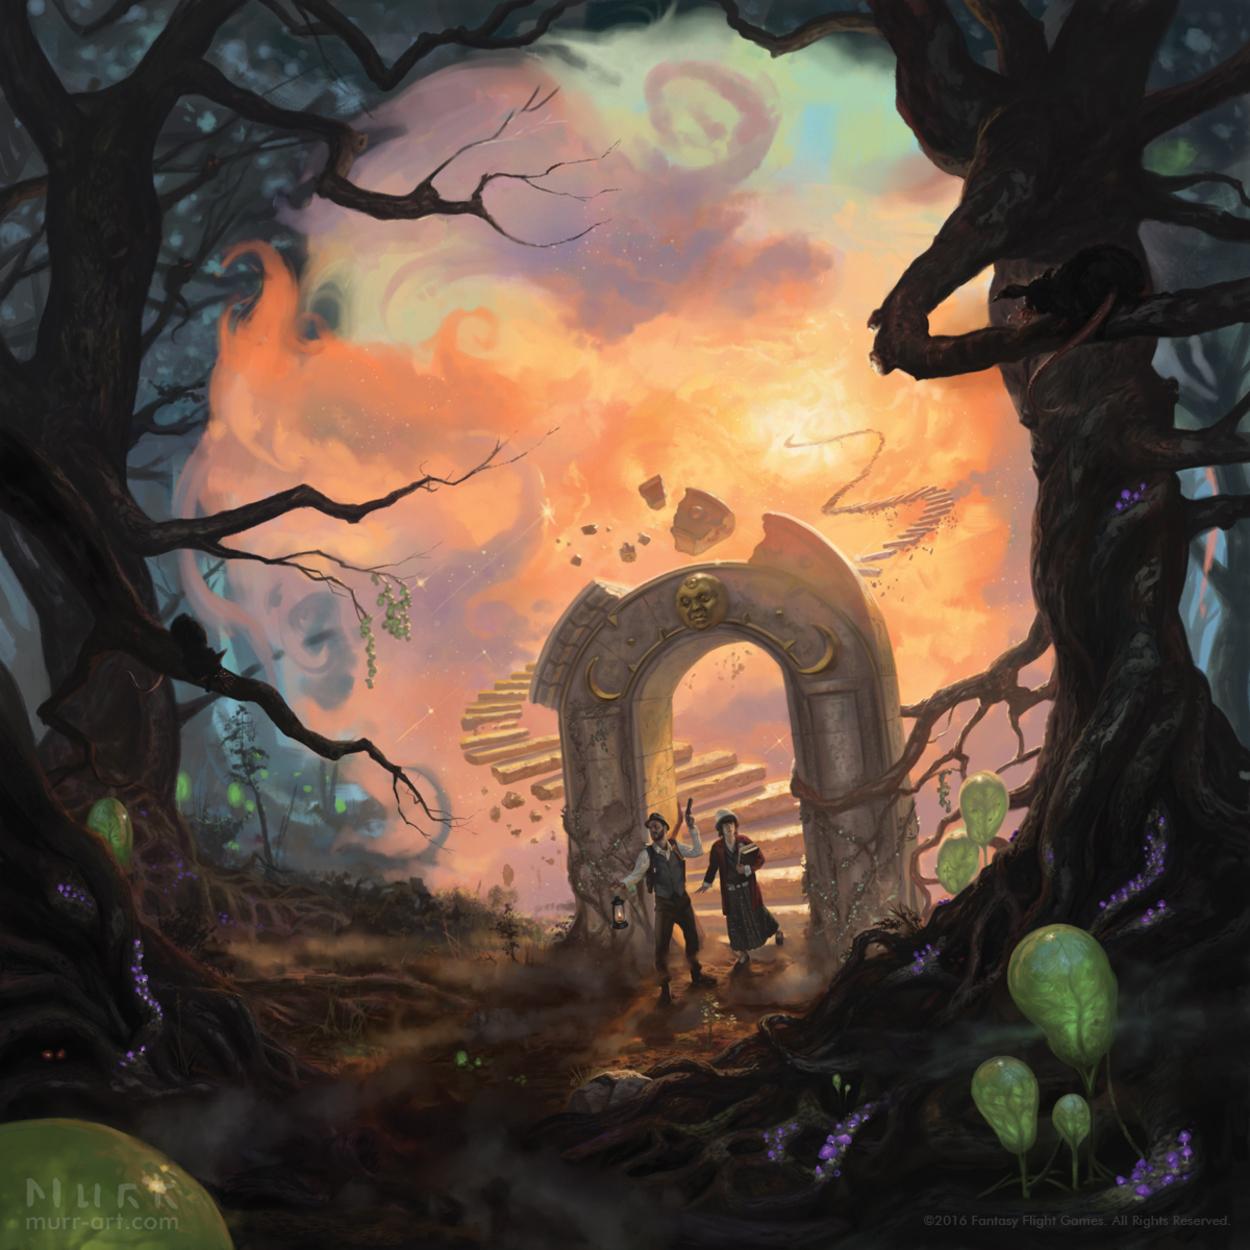 Eldritch Horror: The Dreamlands Artwork by Jake Murray